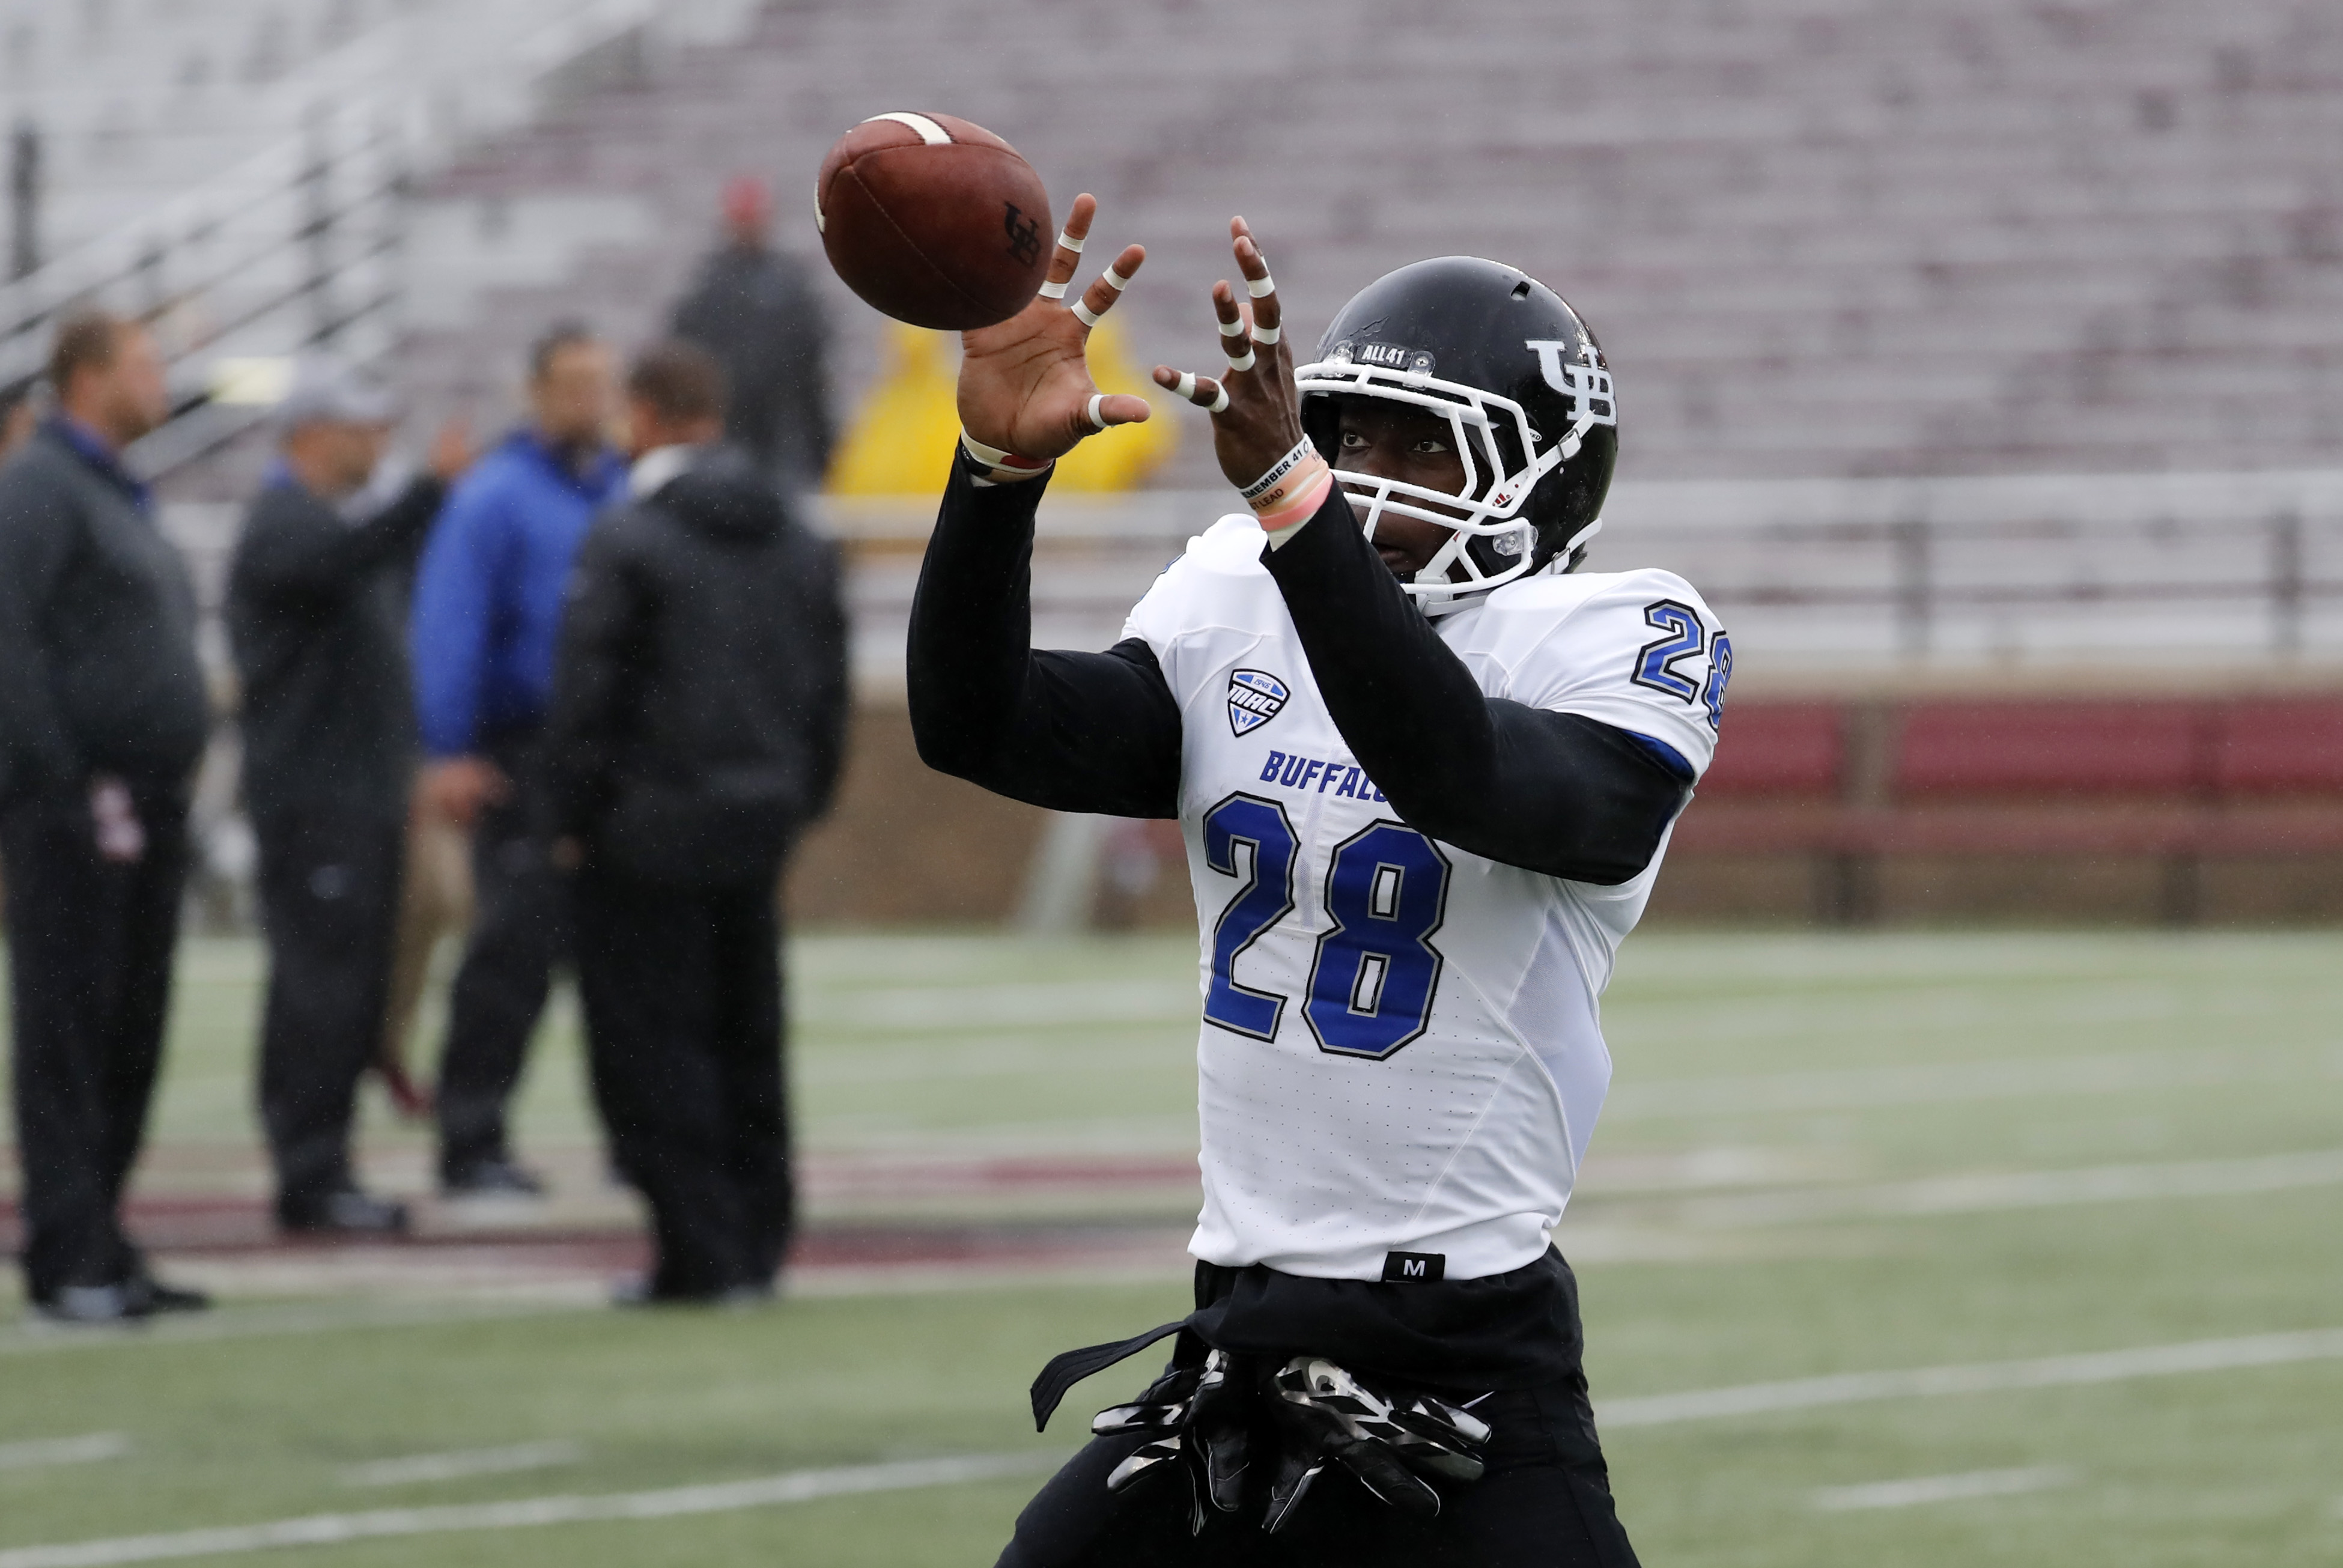 NCAA FOOTBALL: OCT 01 Buffalo at Boston College